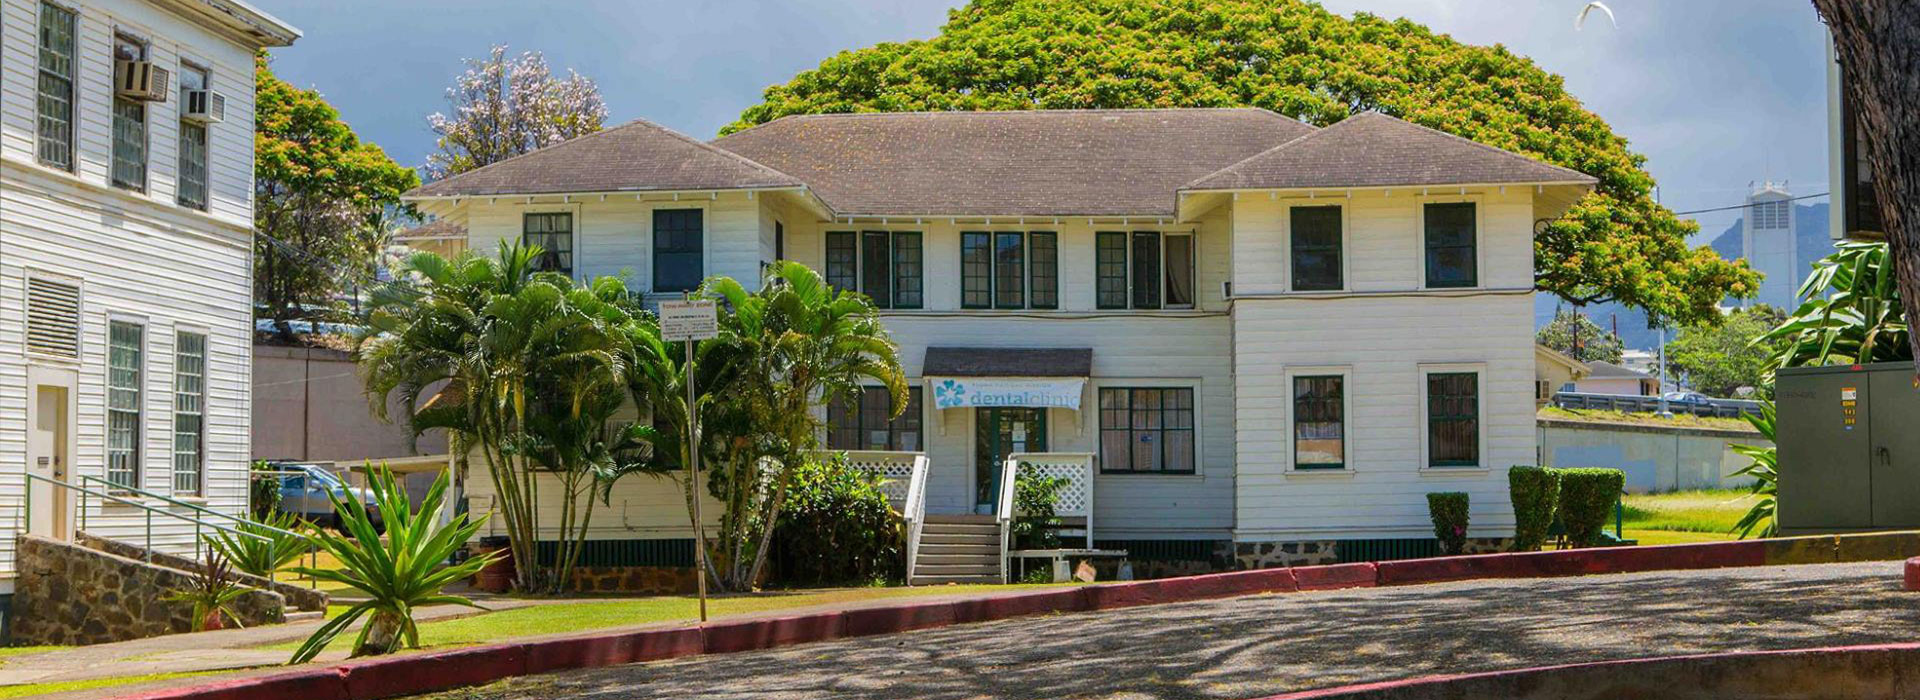 aloha medical mission building